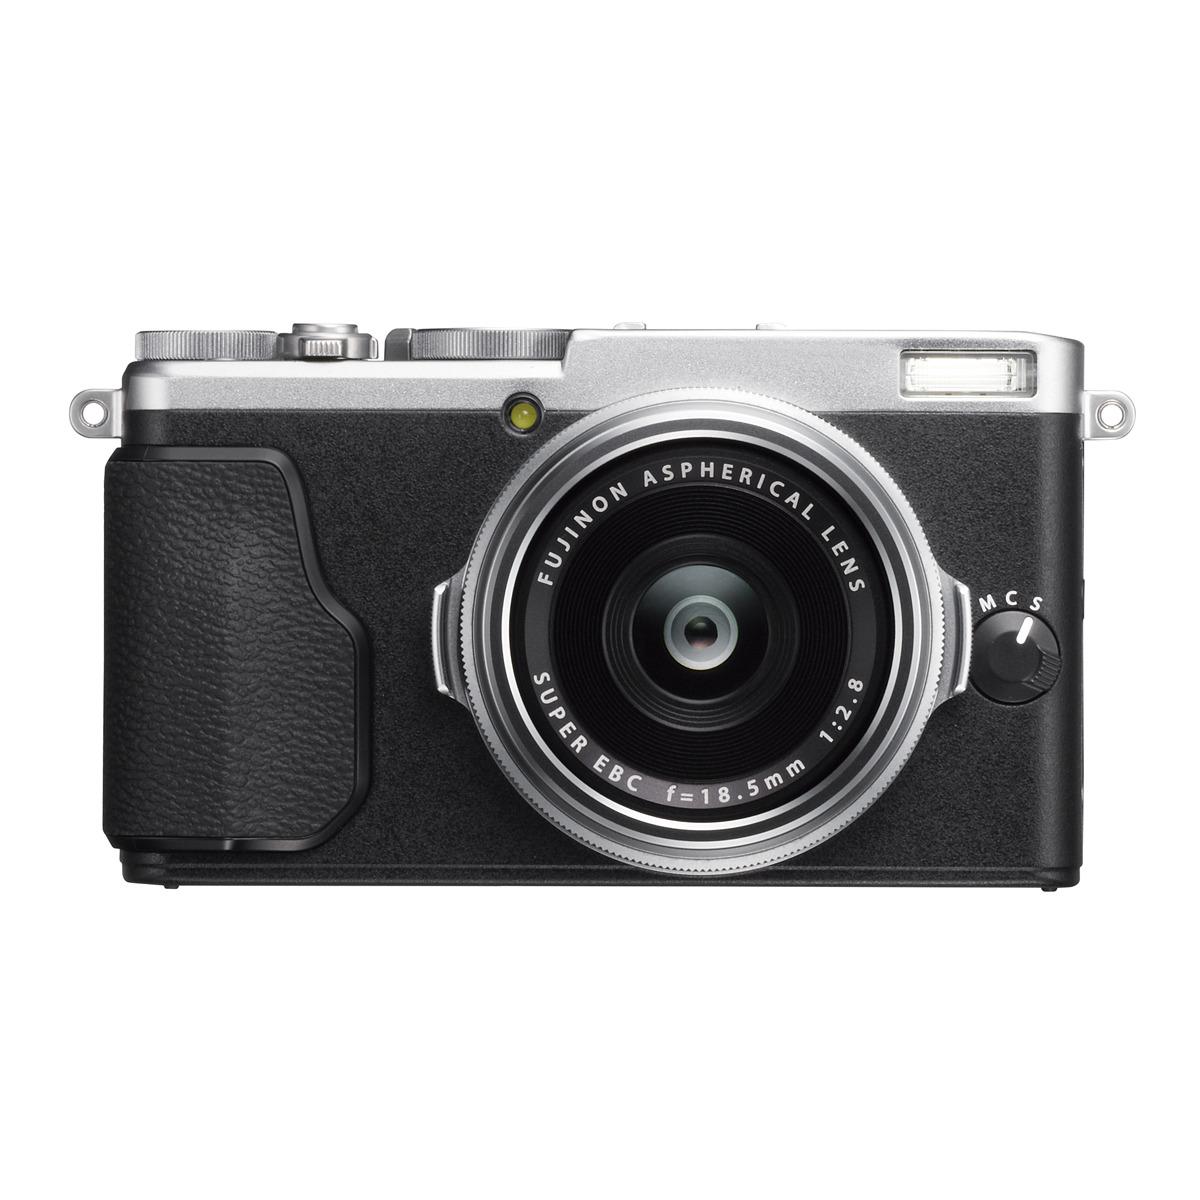 Cámara digital Fujifilm X70 de 16 MP